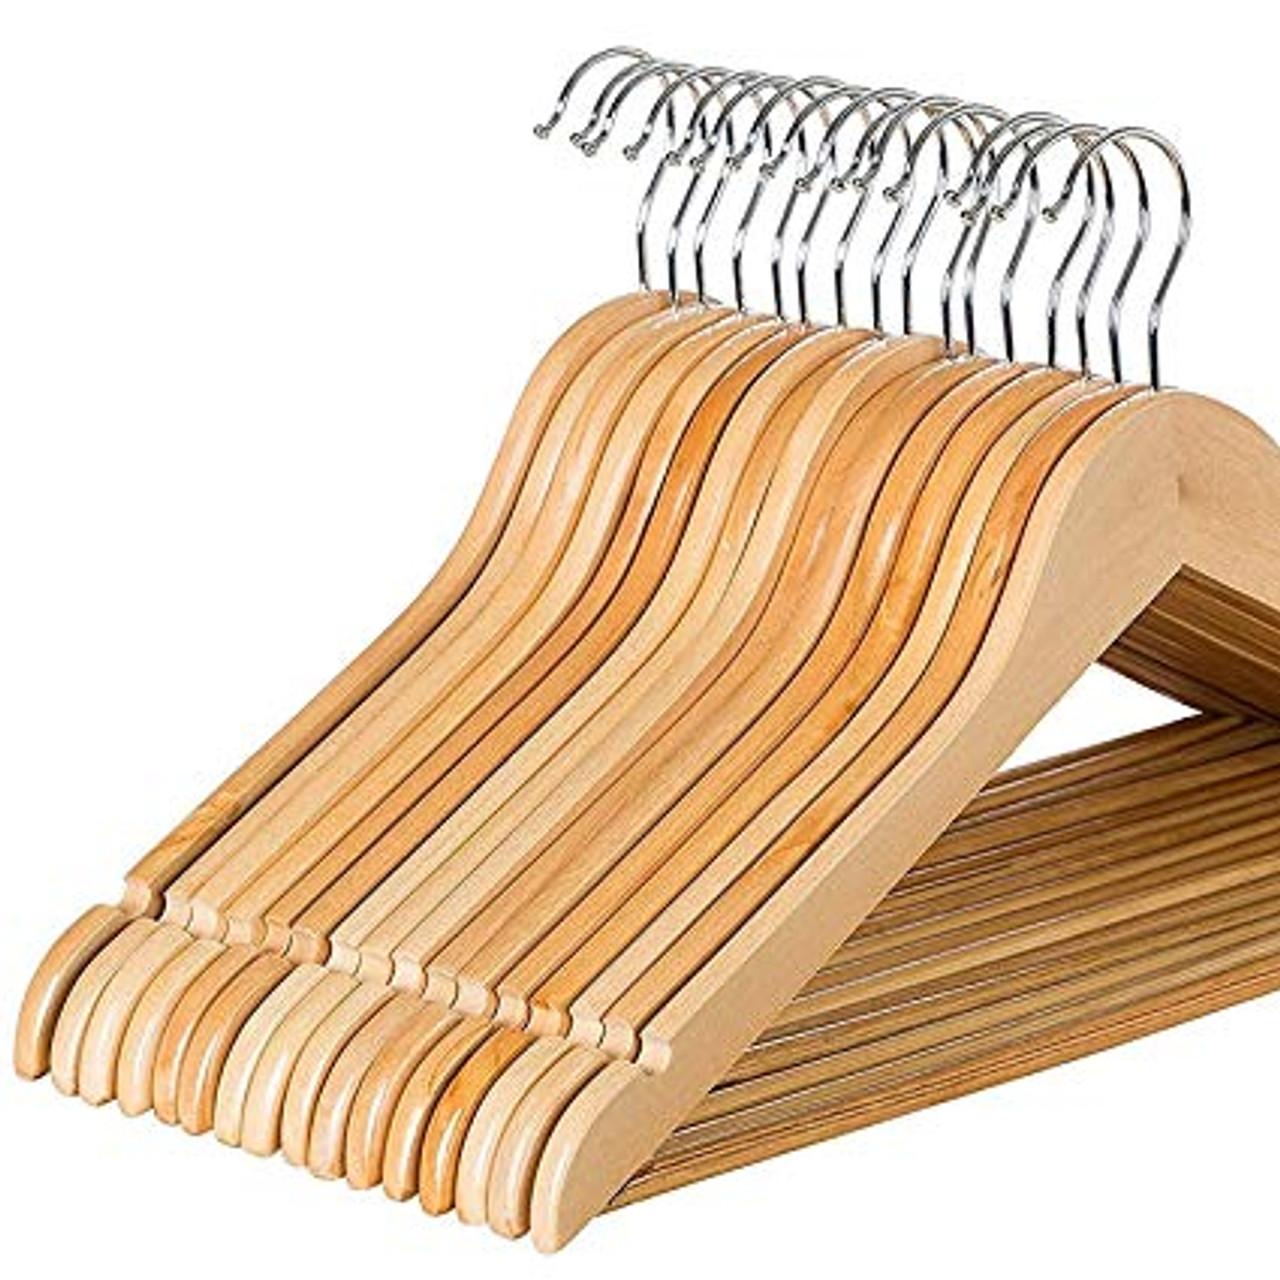 Rental - Wooden Clothing Hangers